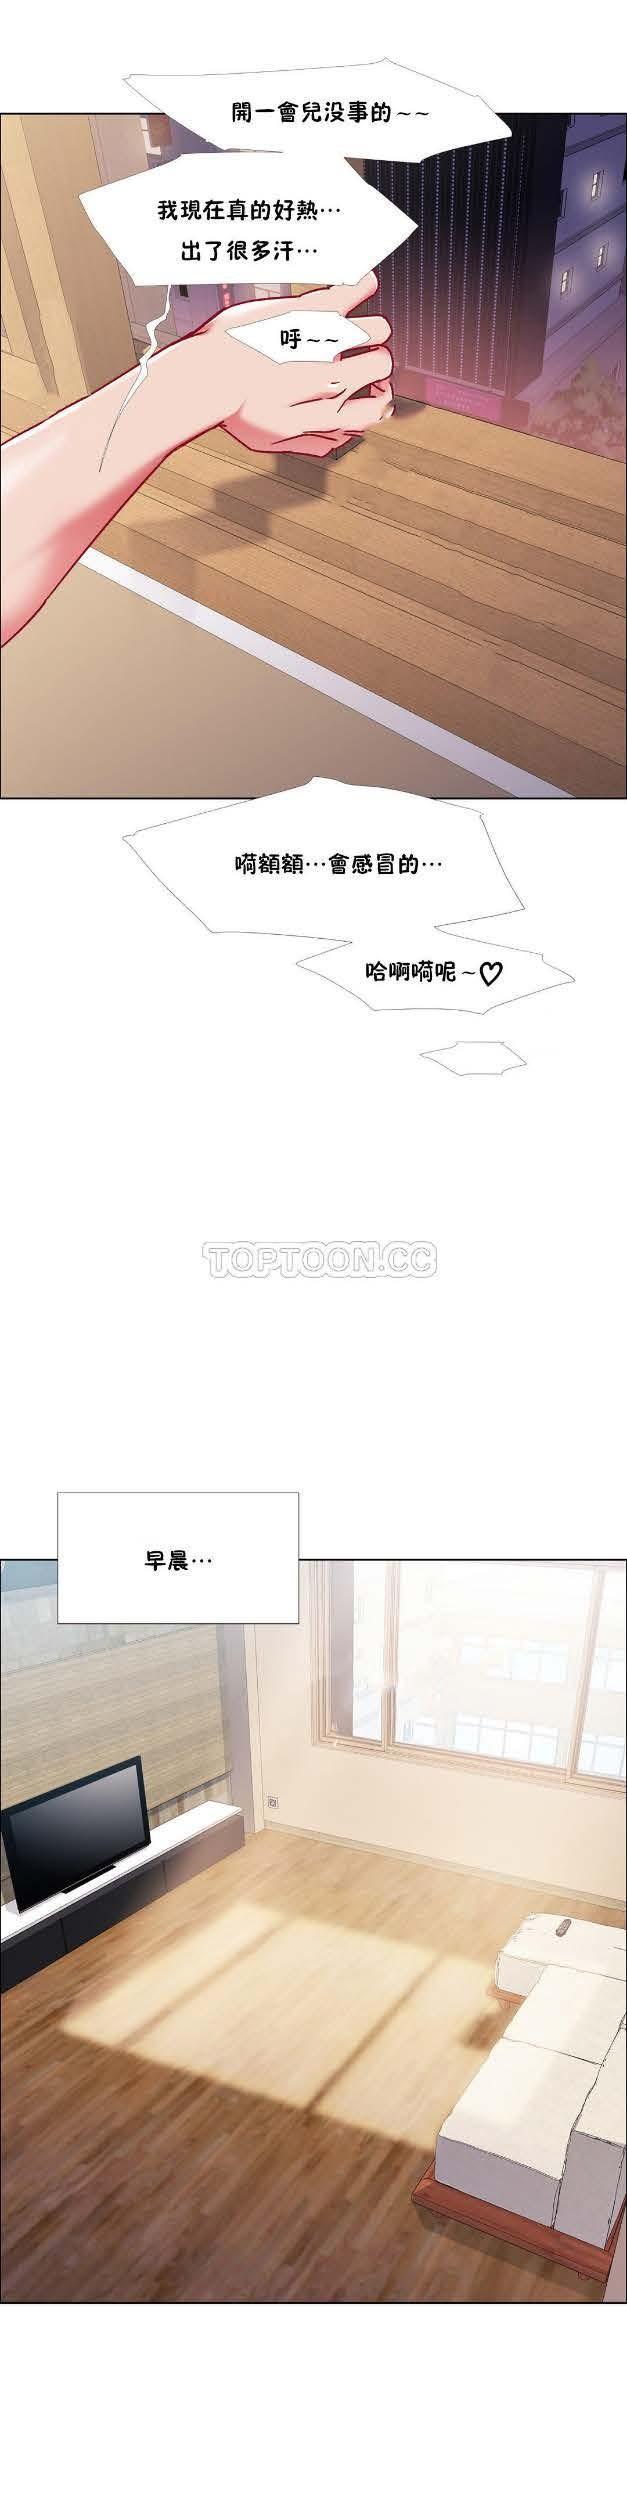 [Studio Wannabe] Rental Girls | 出租女郎 Ch. 33-58 [Chinese]  第二季 完结 283